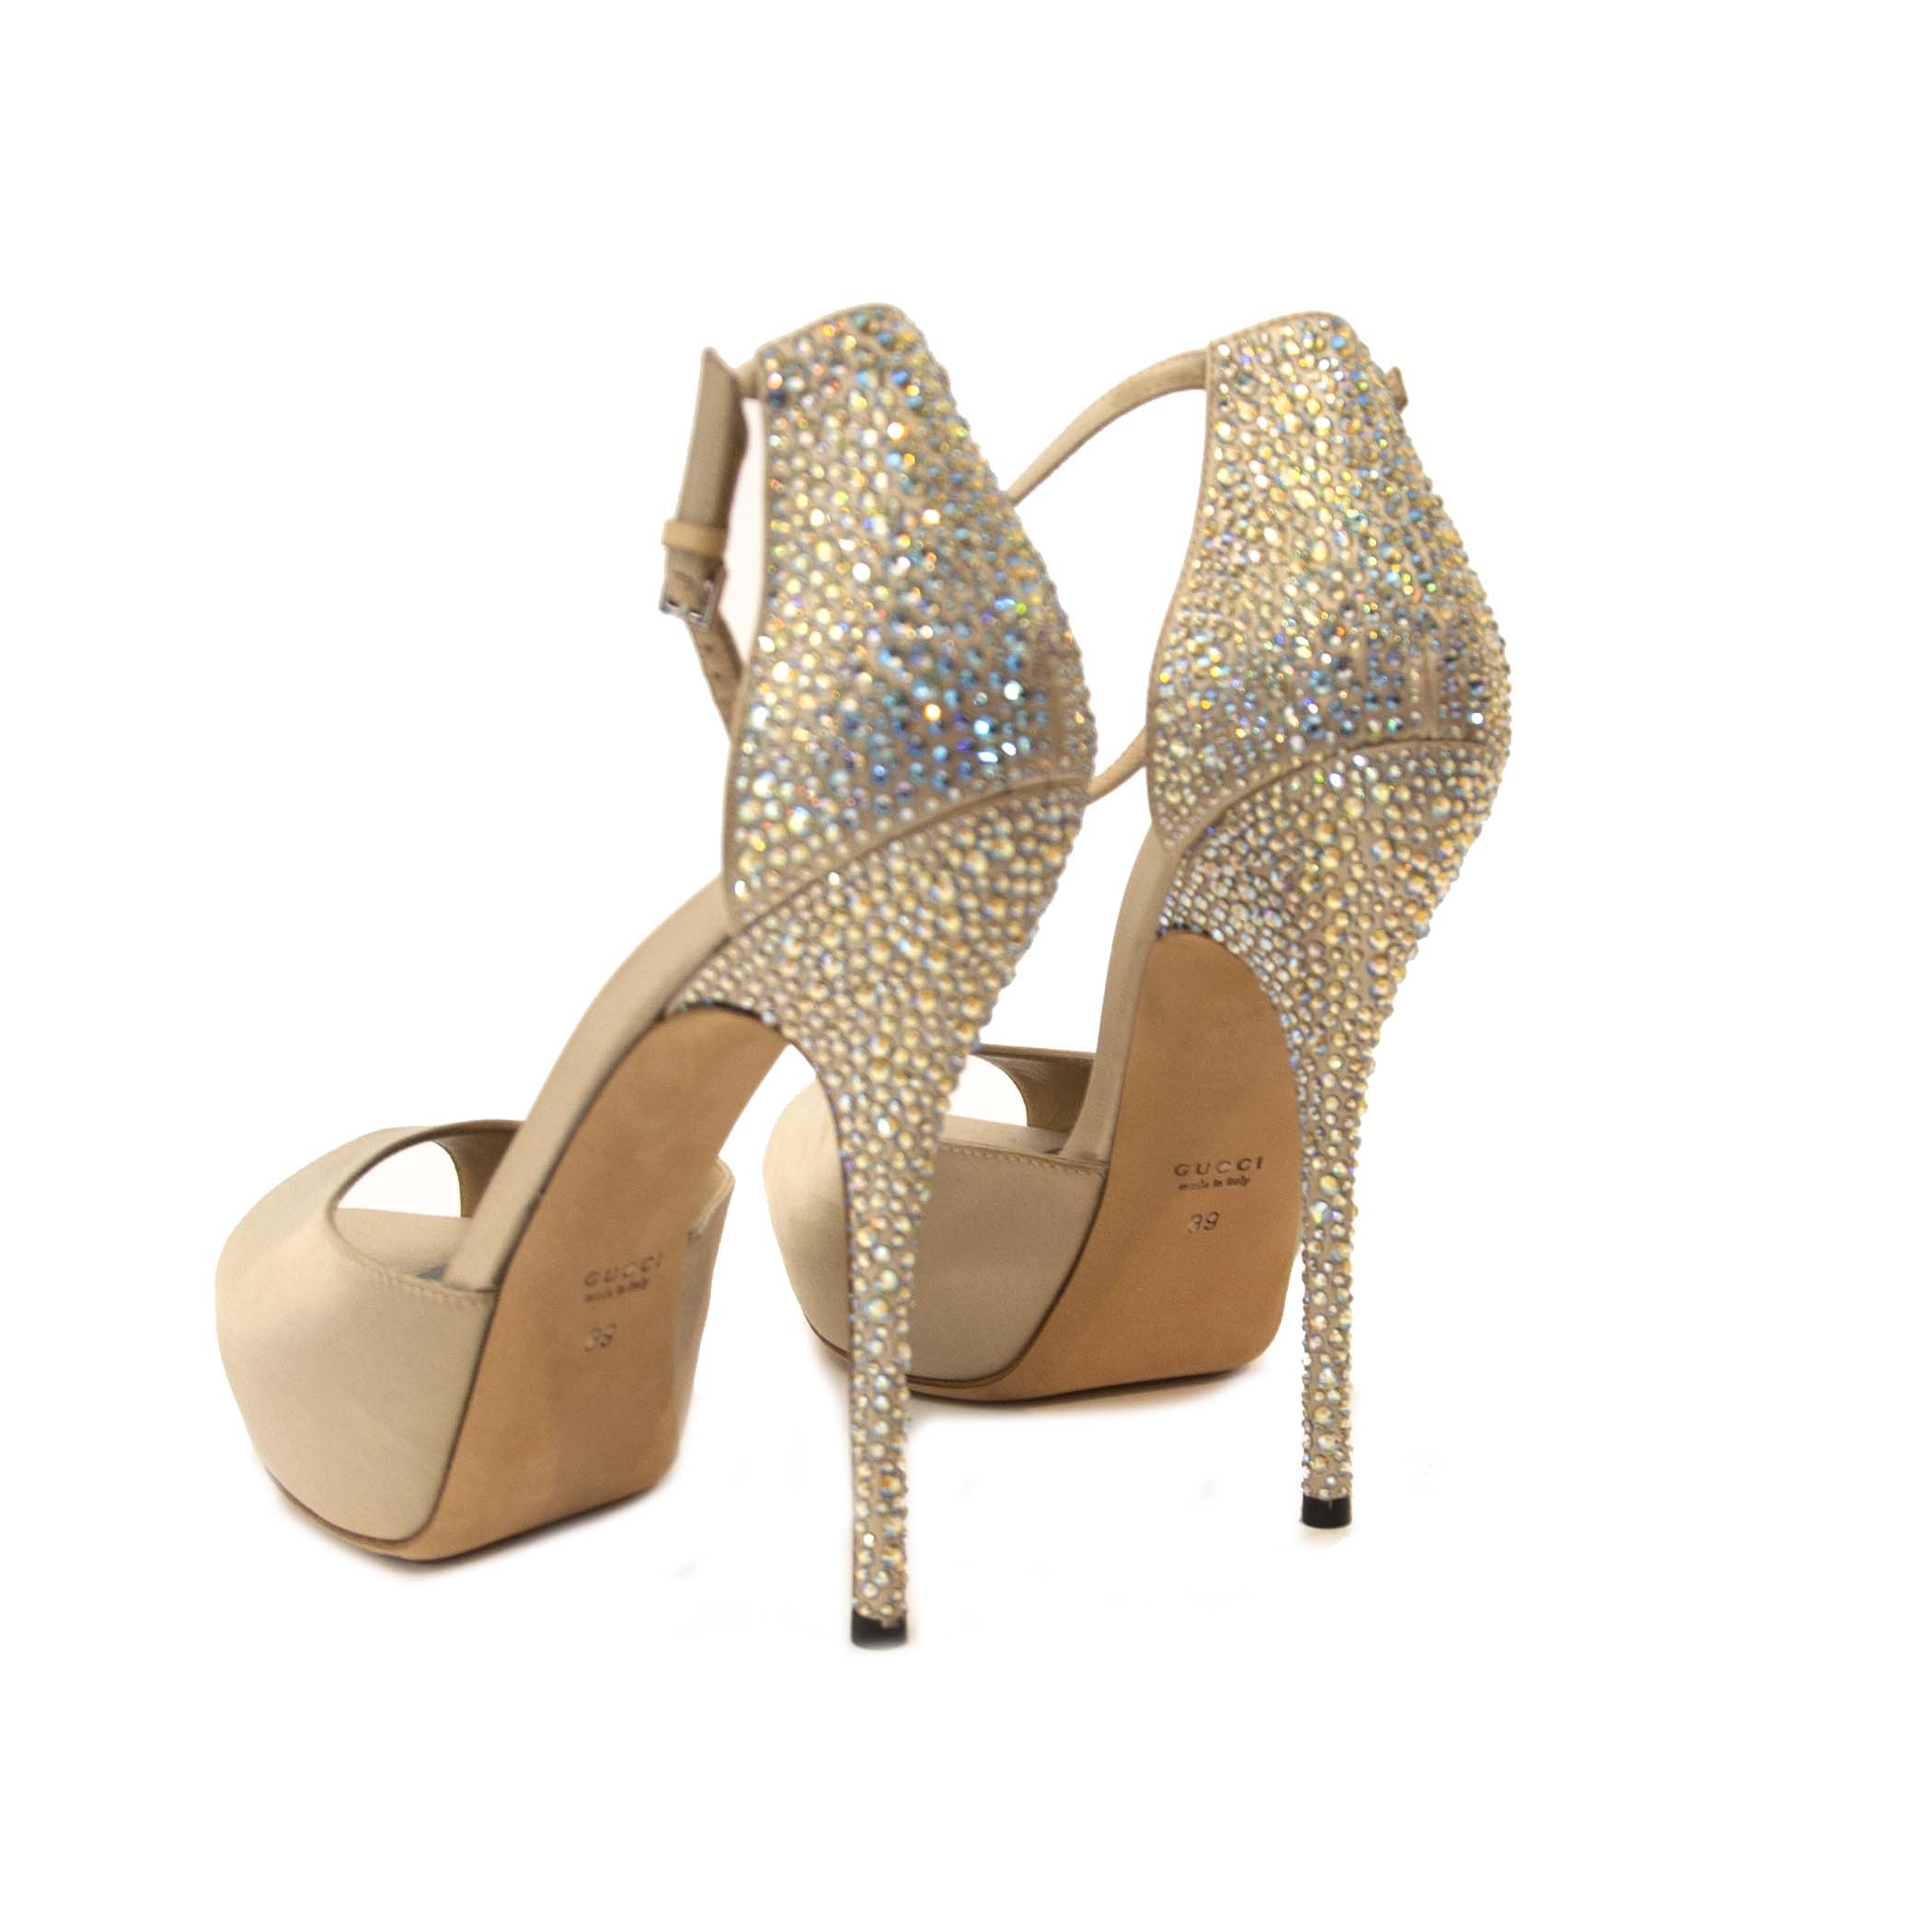 Gucci Nude Satin and Swarovski Heels - size 39